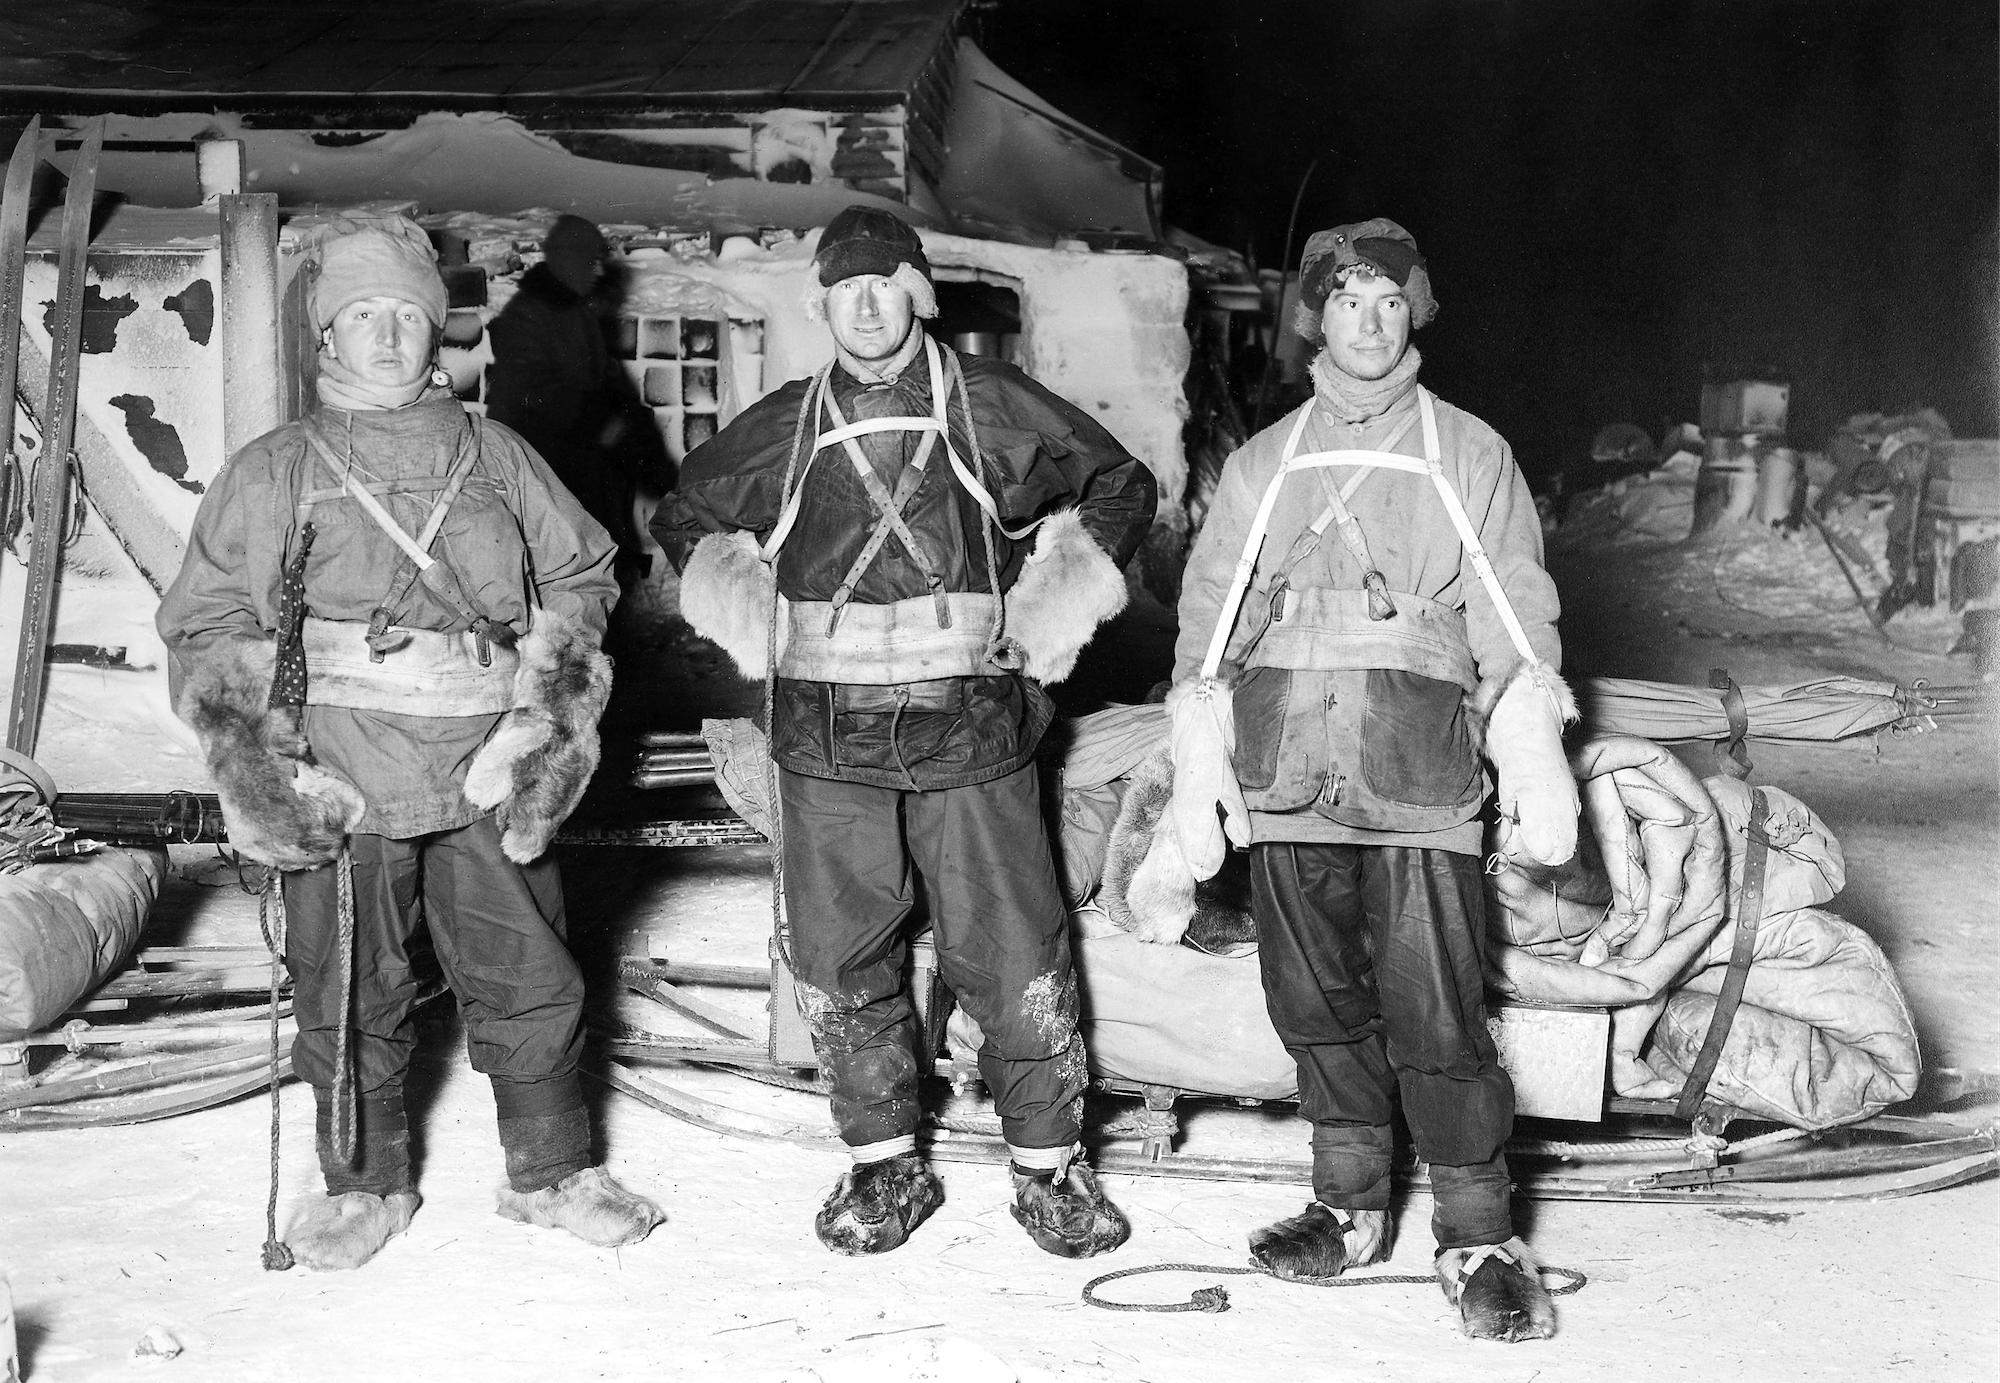 Eyewitness Accounts with Scott in the Antarctic  by Herbert Ponting